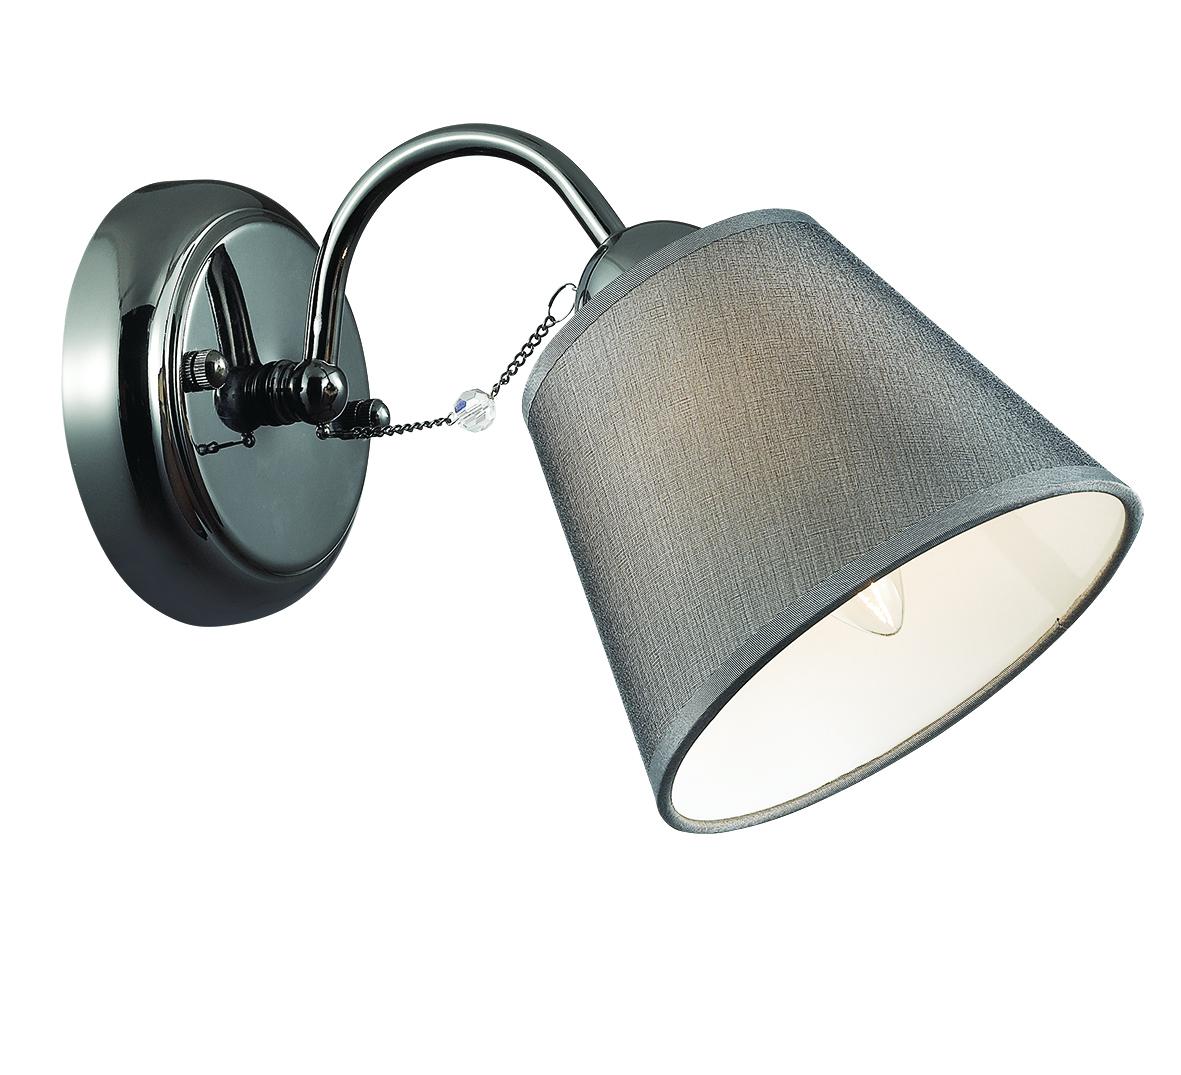 Бра Lumion Porta 2974/1W, 1xE14x40W, черный хром, серый, прозрачный, хром, металл, текстиль, хрусталь - фото 1